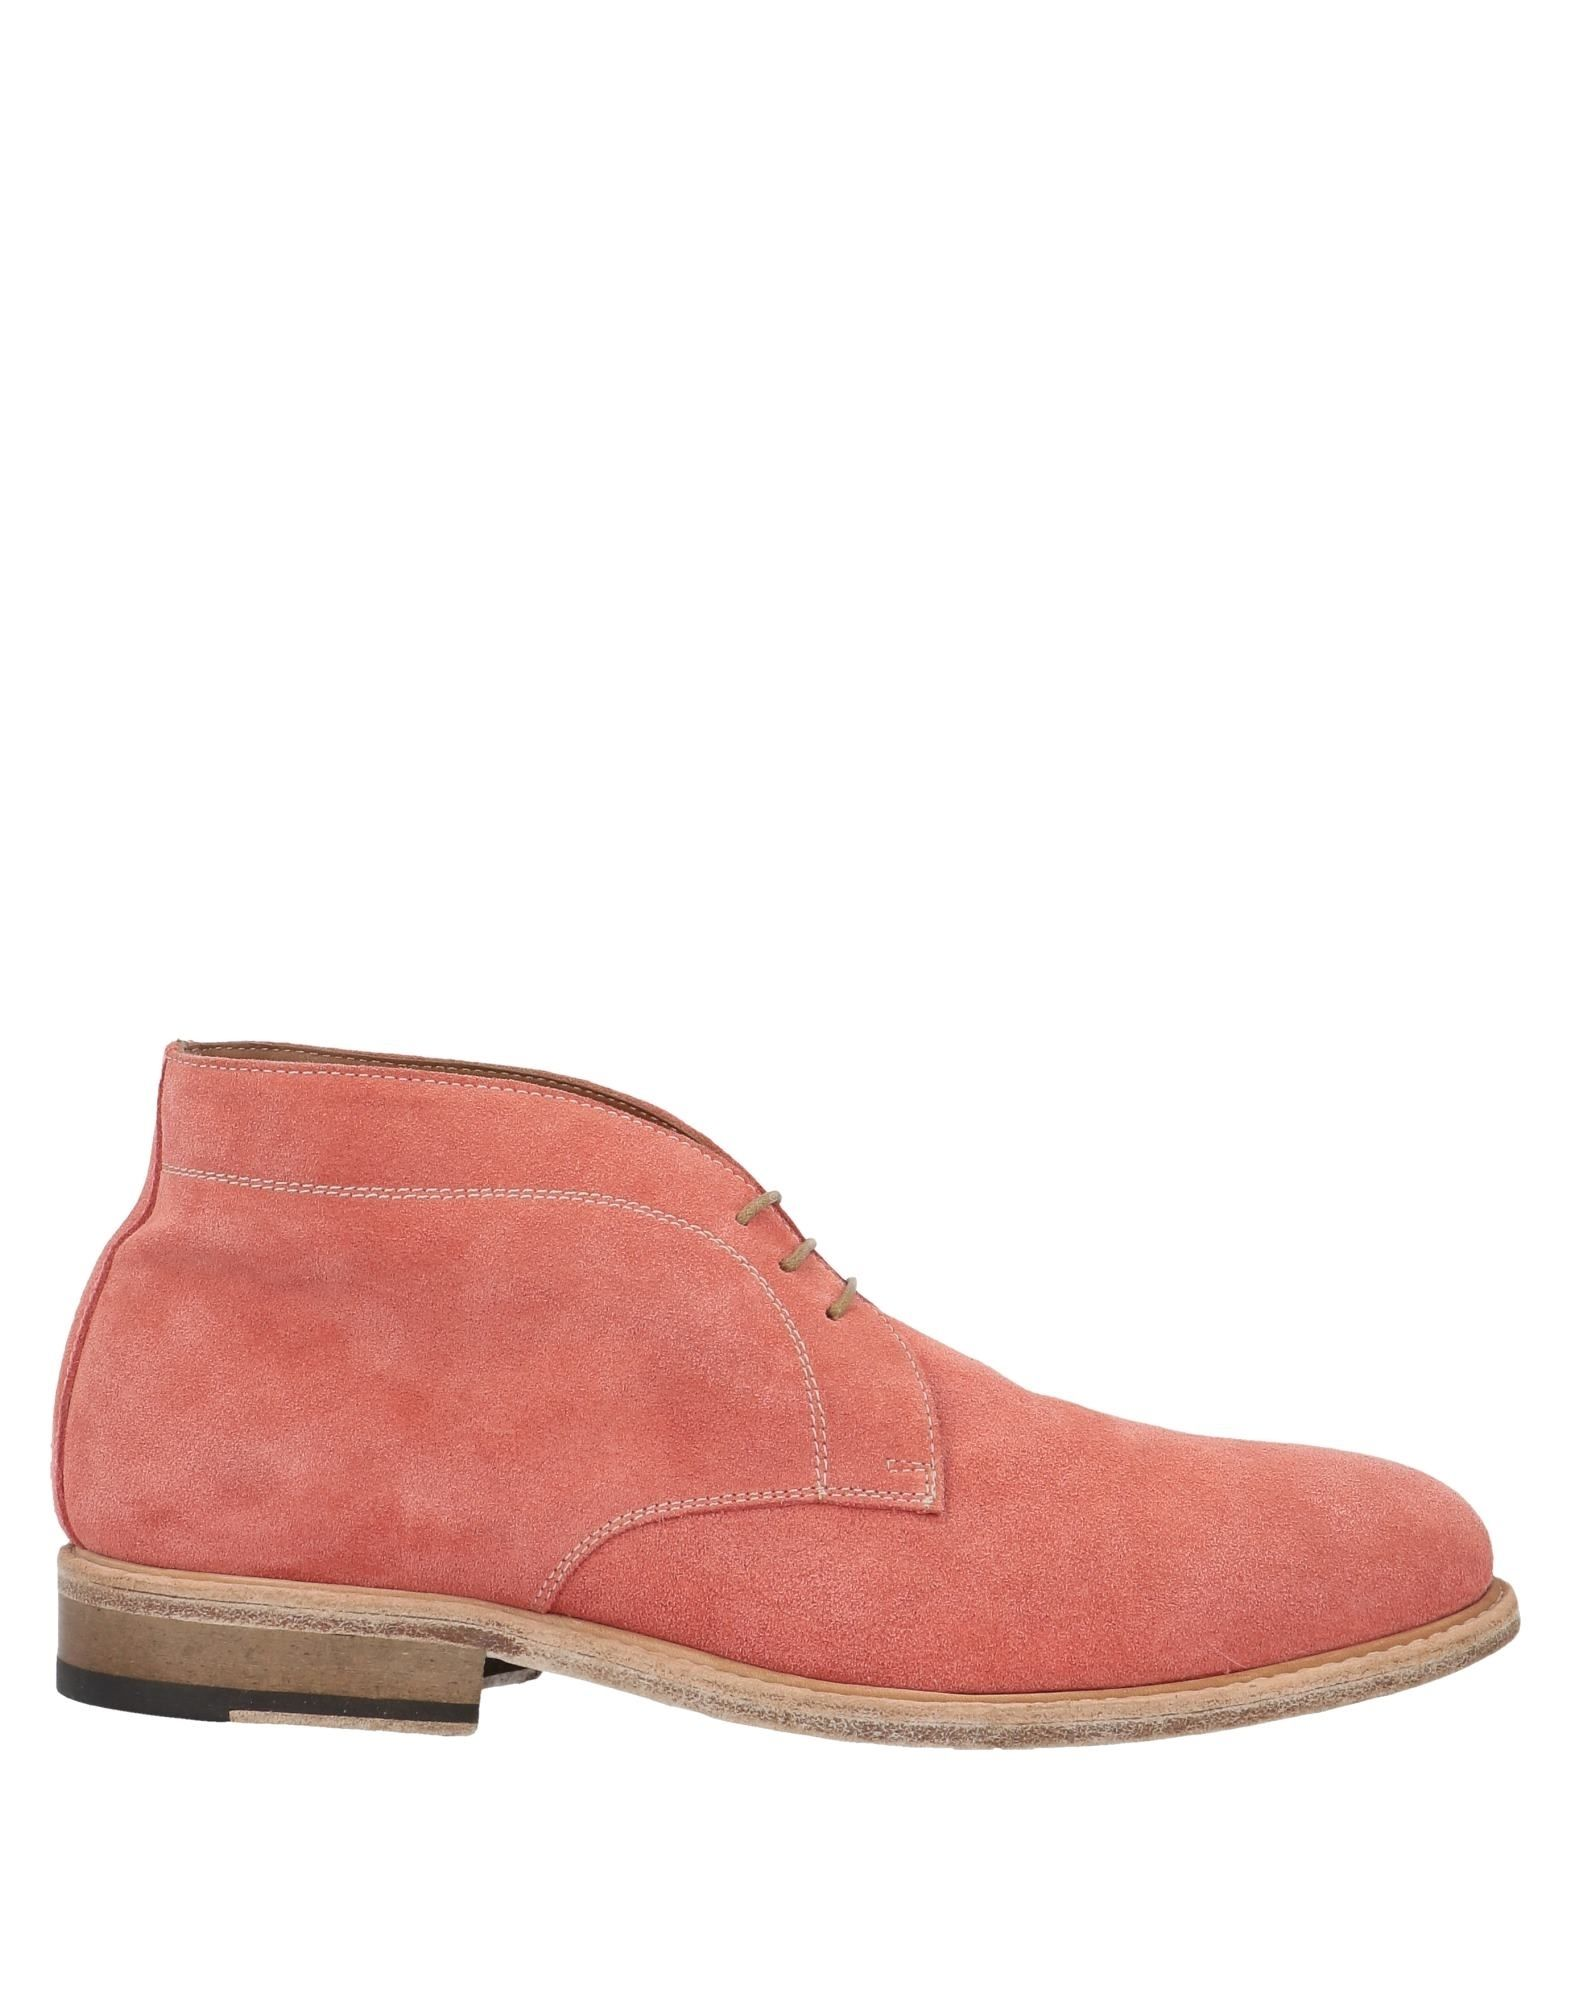 BRUNO PARMIGIANI Полусапоги и высокие ботинки parmigiani pershing pfc528 3402500 xa3142